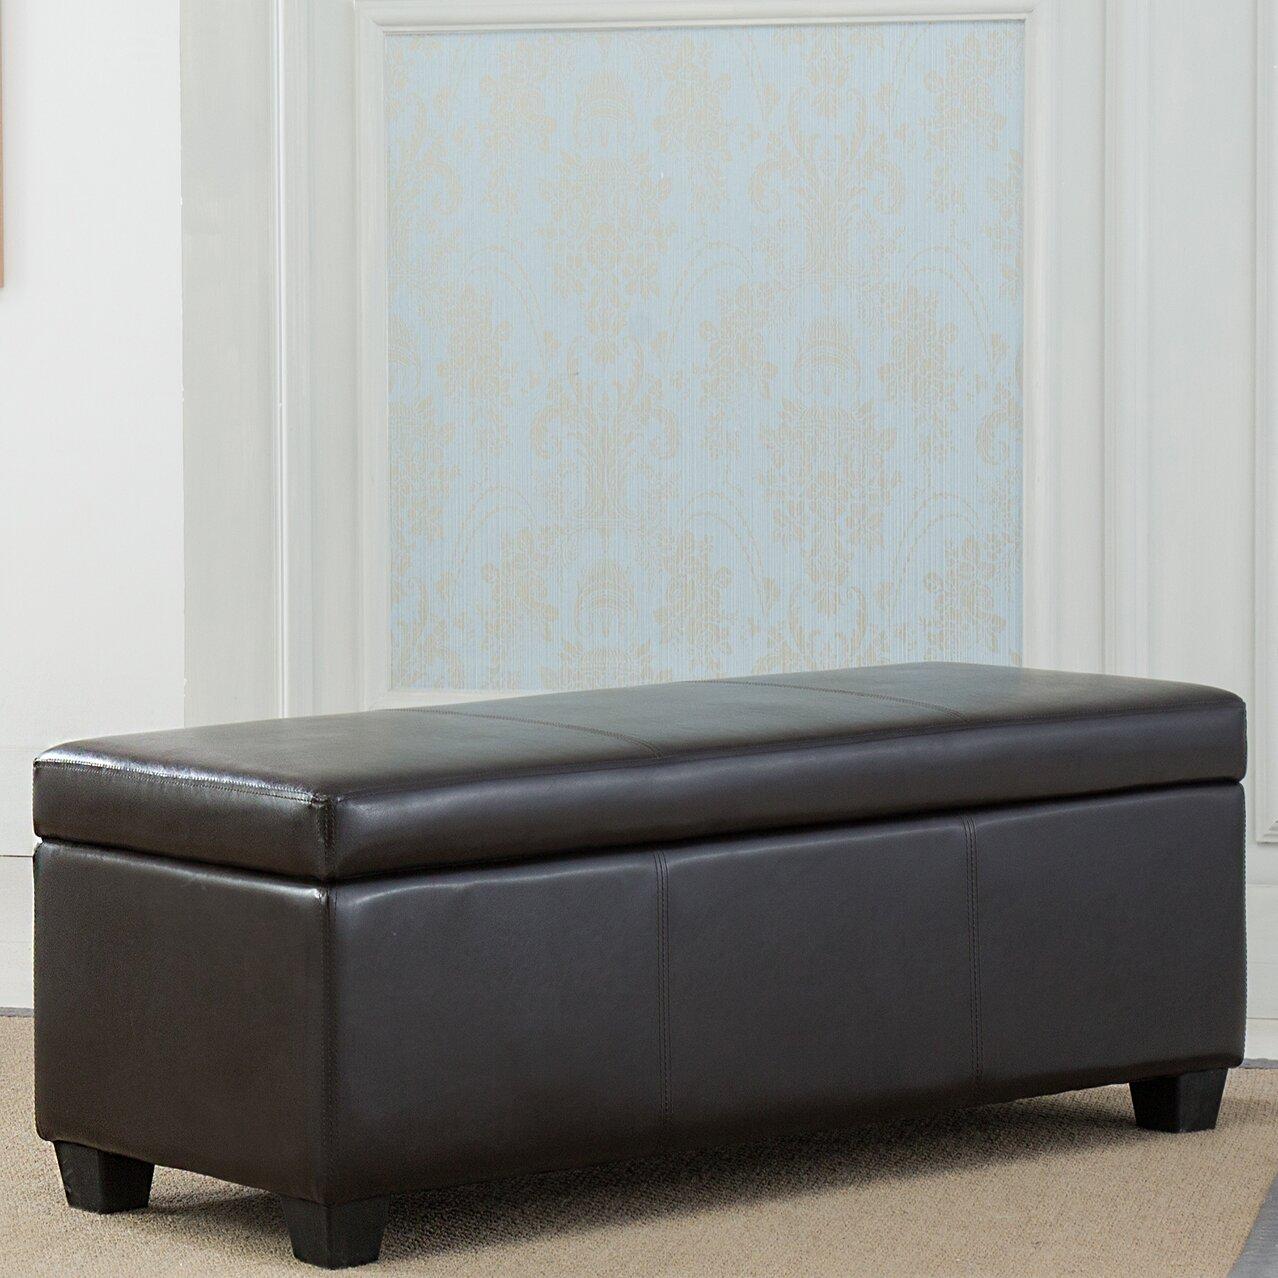 Padded Bench For Bedroom Belleze Upholstered Storage Bedroom Bench Reviews Wayfair